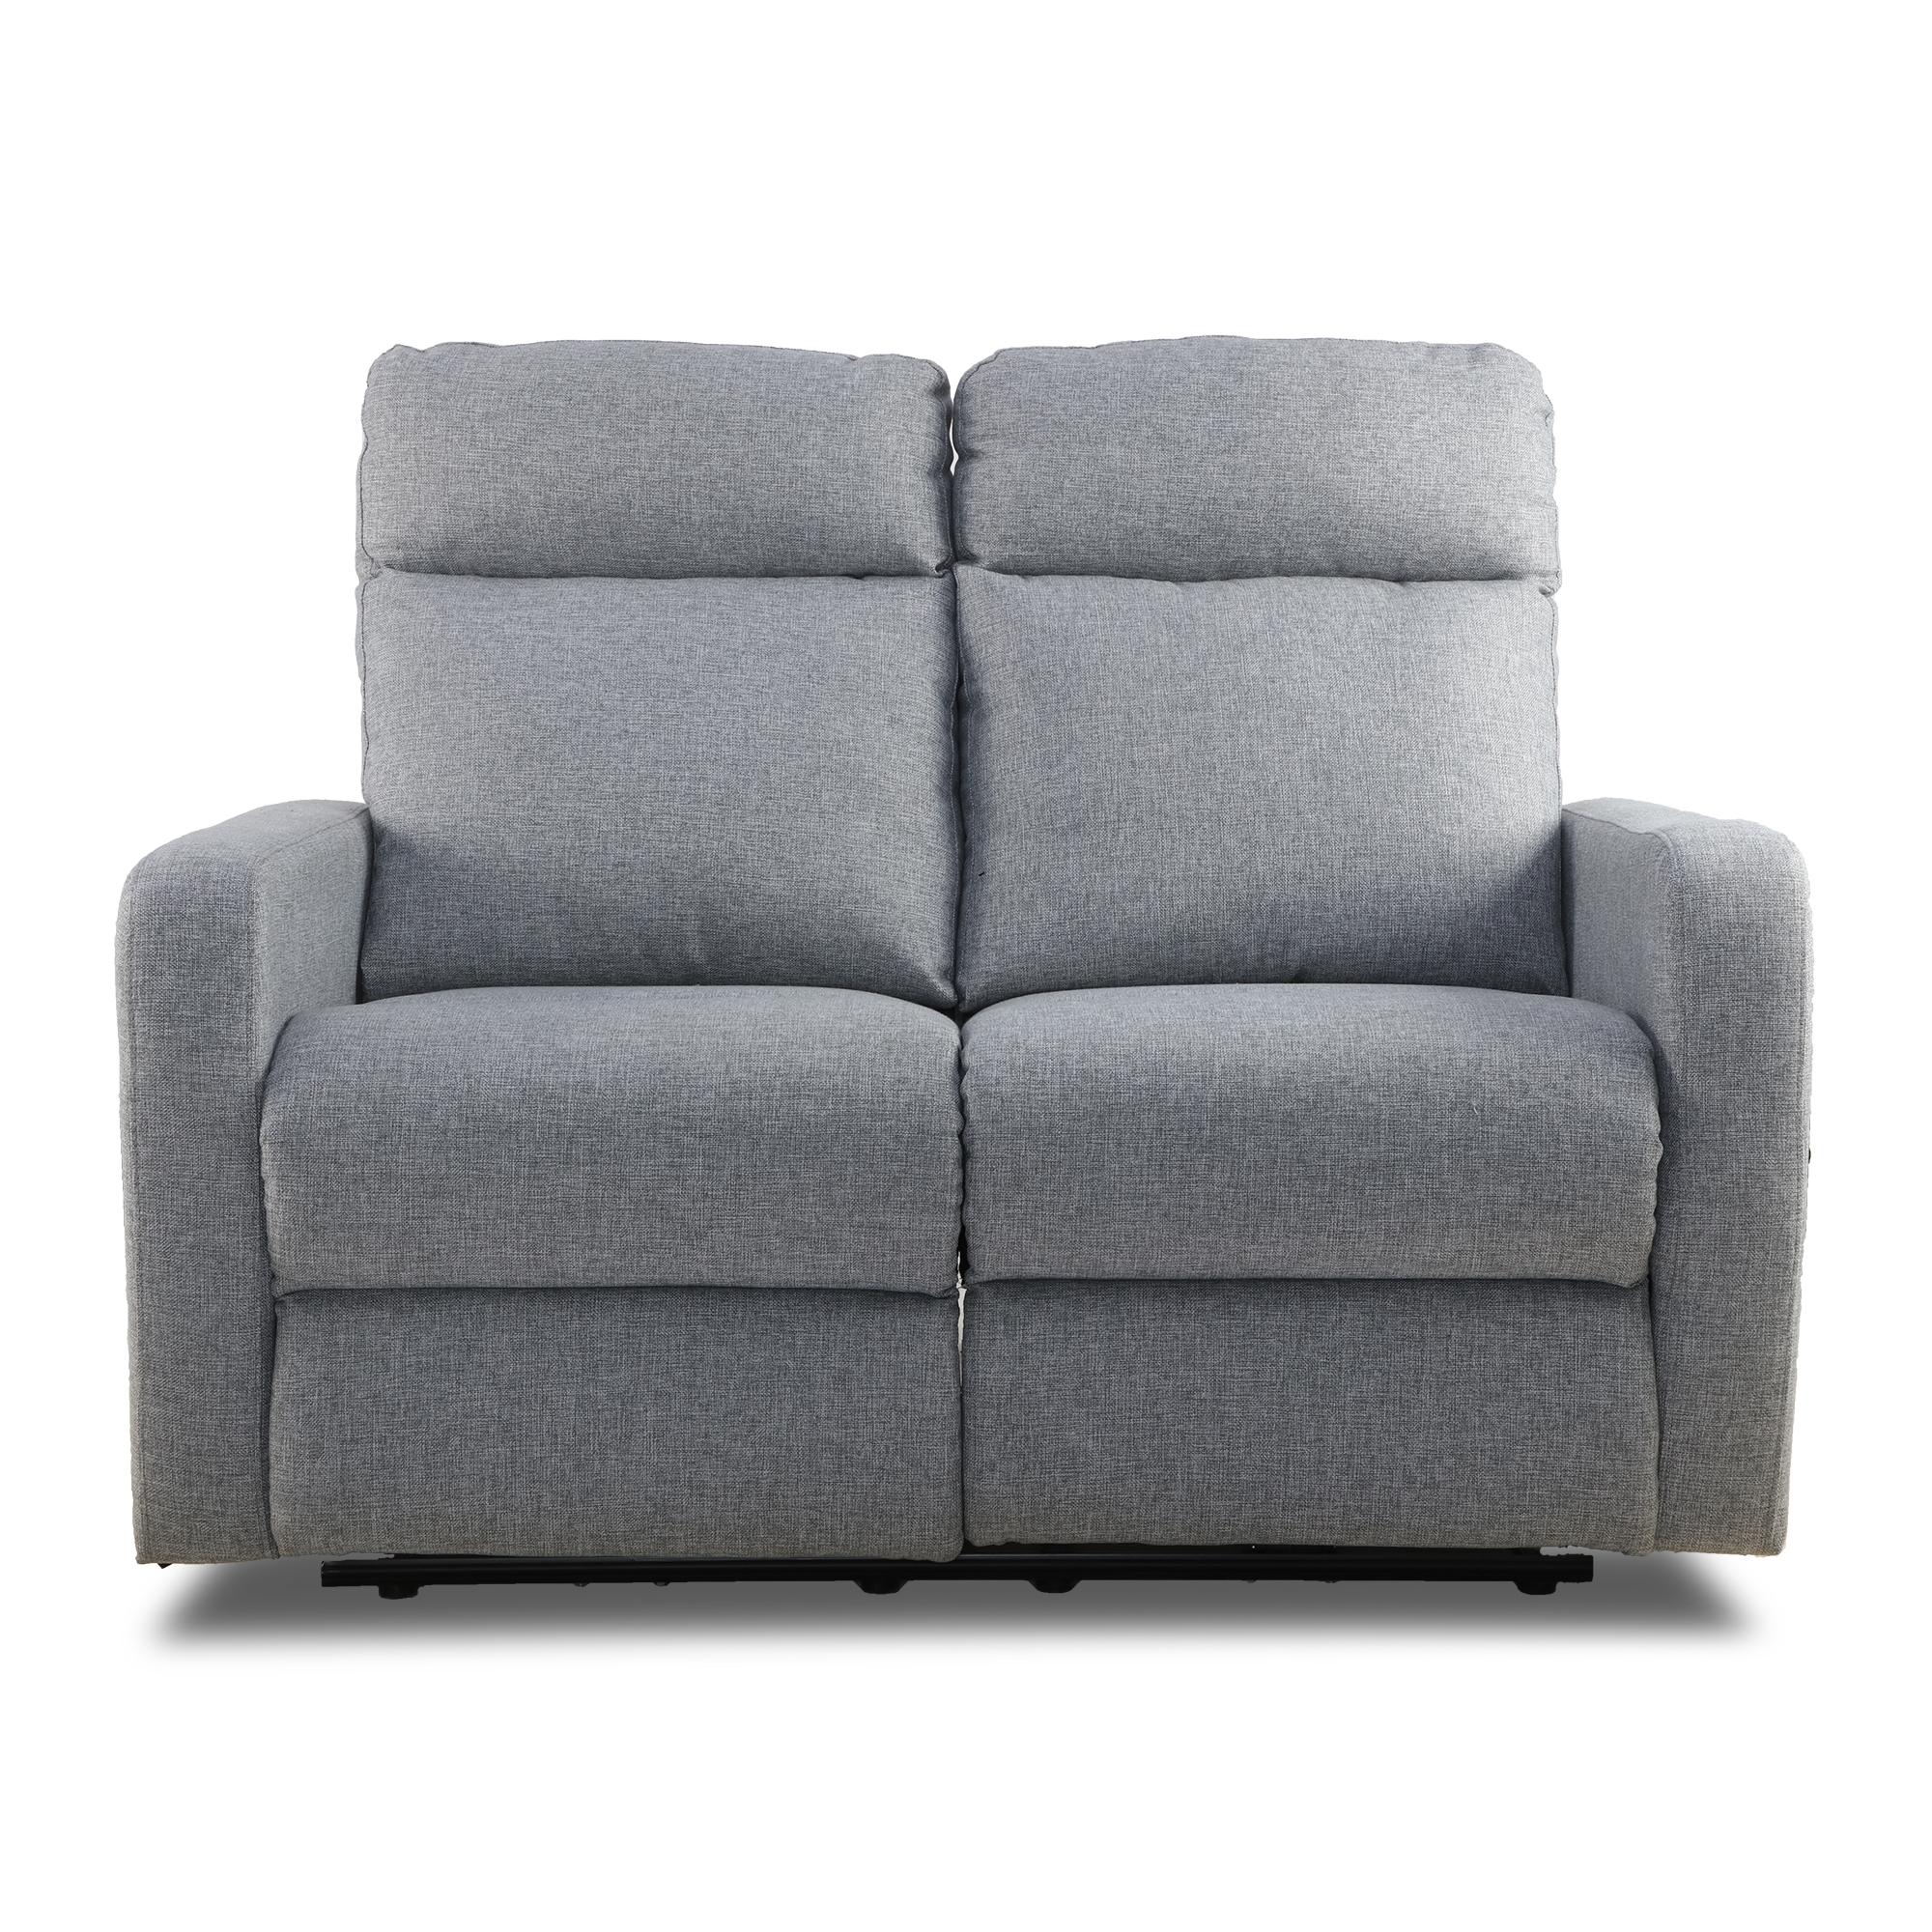 Sofa And Loveseat Set Modern Sofa Designs 2020 Zhejiang Jiaxing Furniture Buy Sofa And Loveseat Set Design Sofa Modern Sofa Designs Product On Alibaba Com